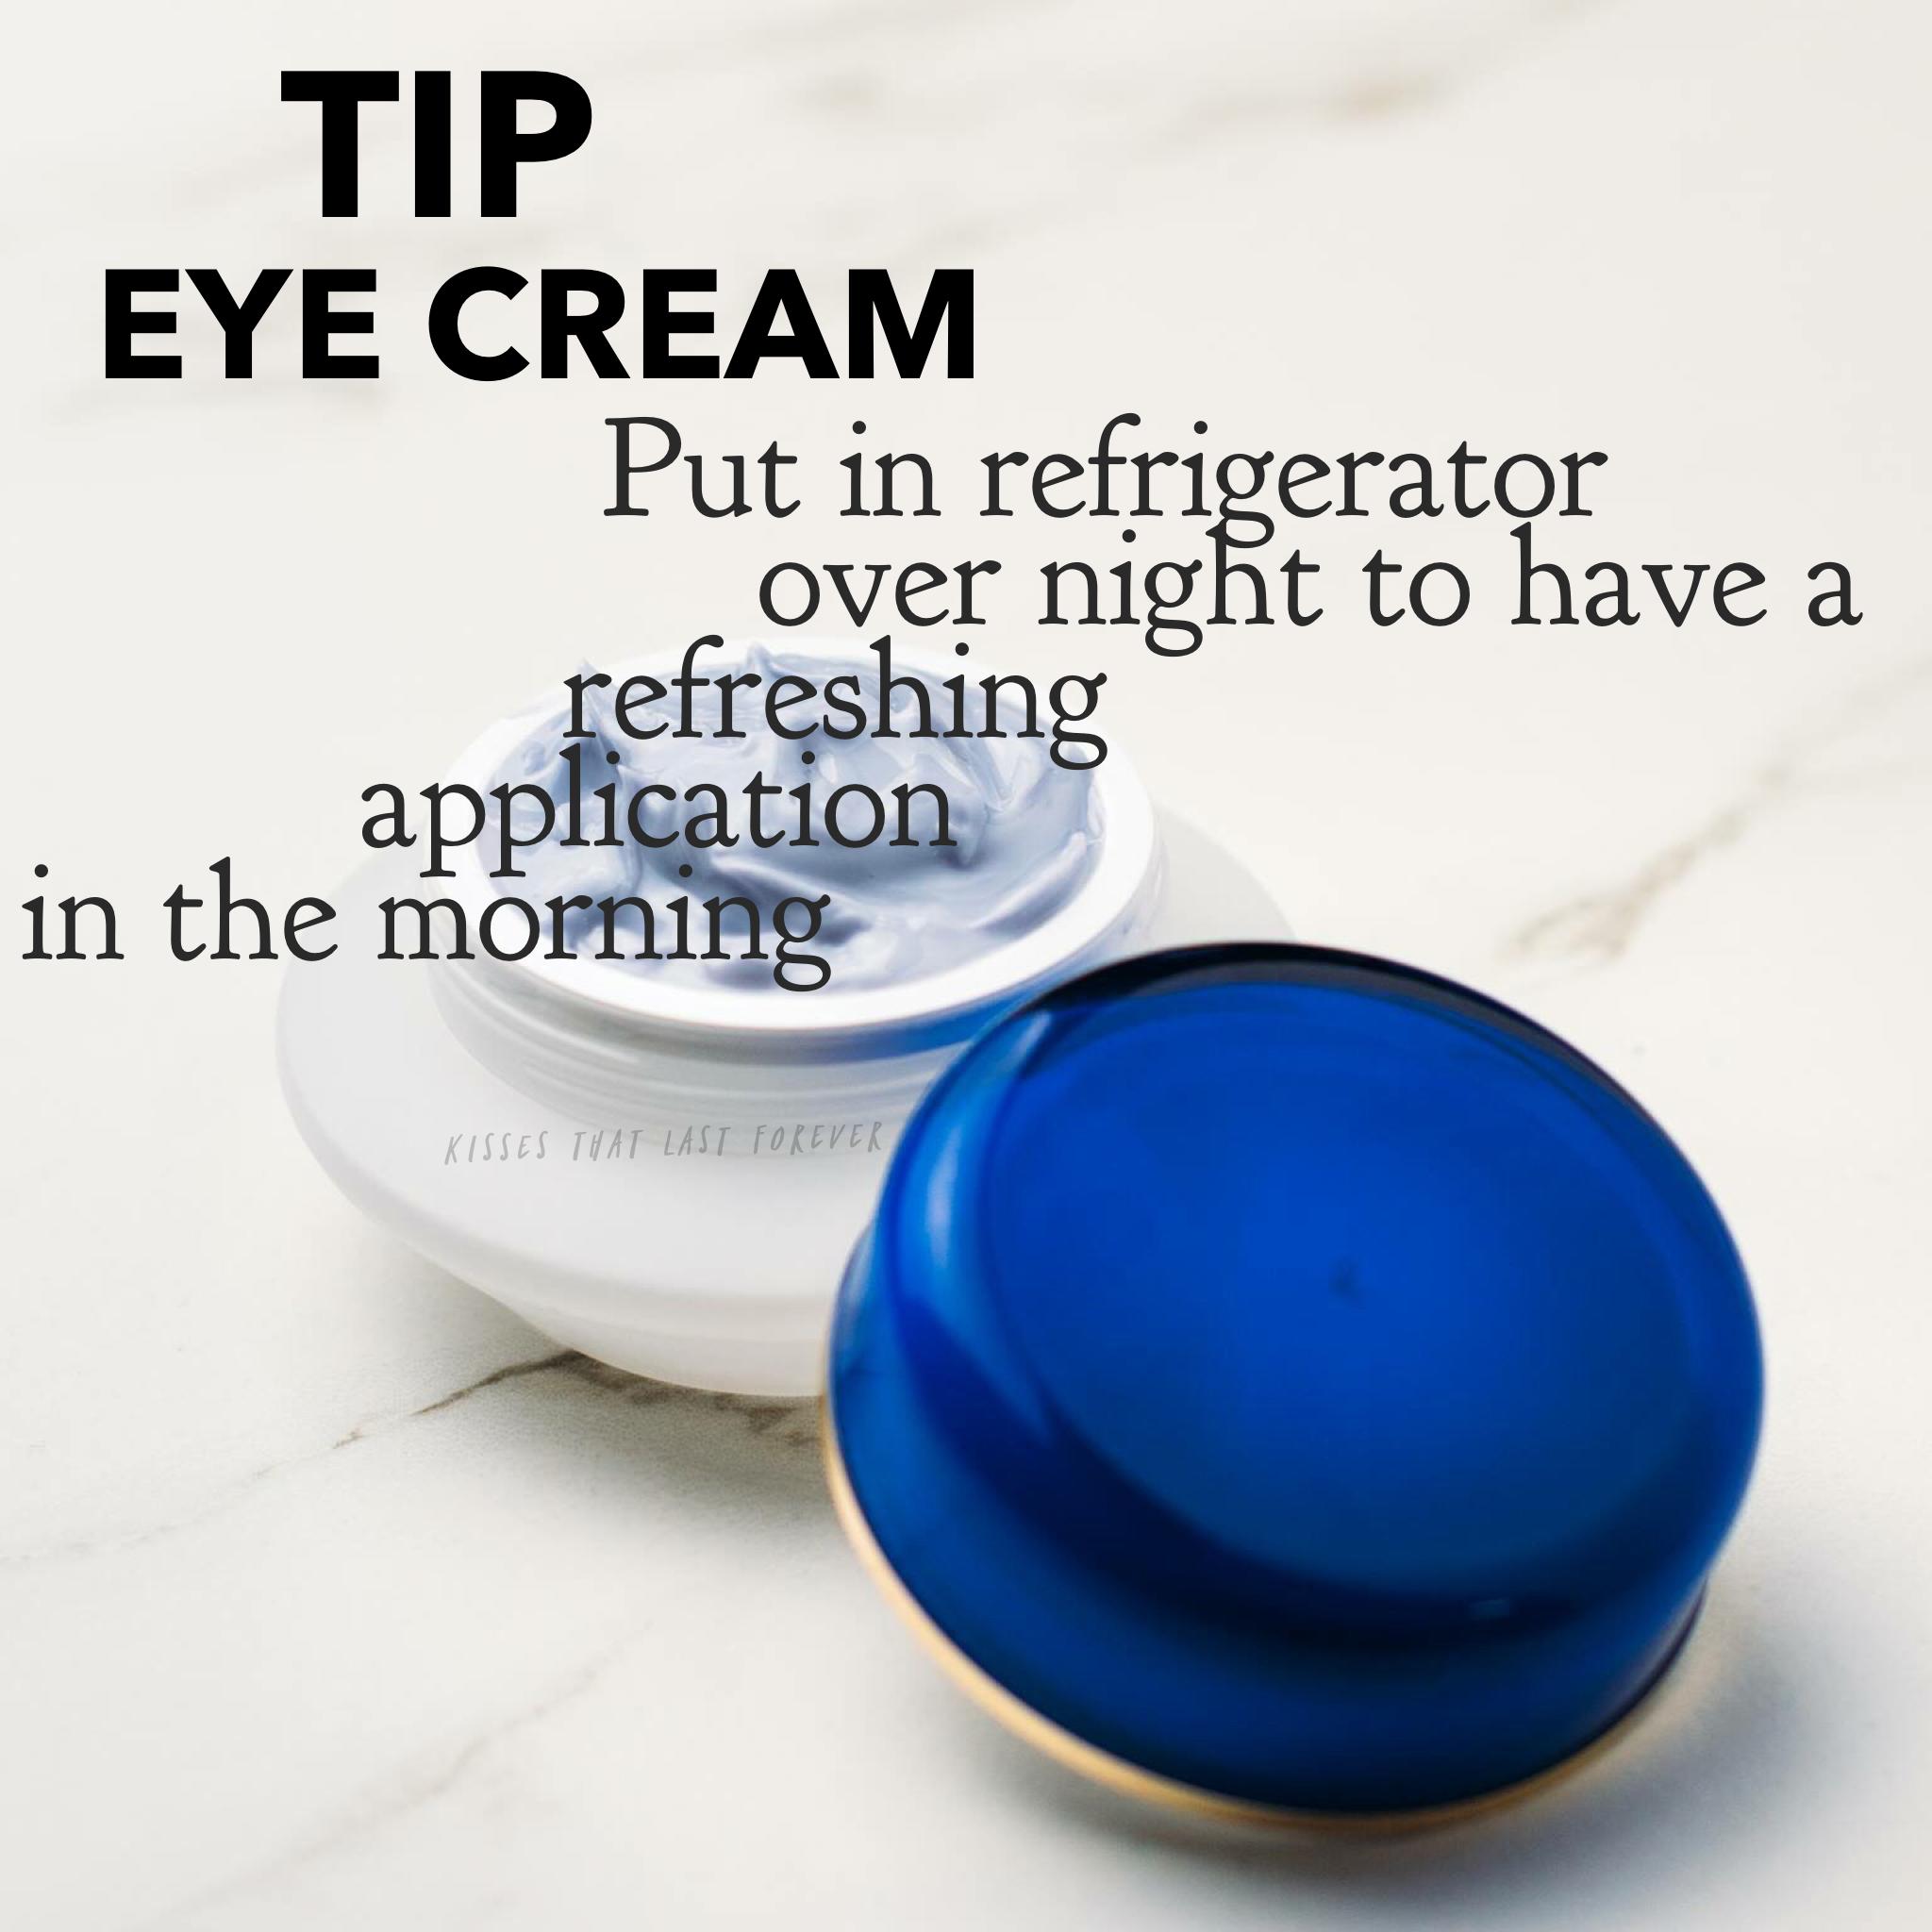 Eye cream SeneGence tips Eye cream, Senegence, Anti